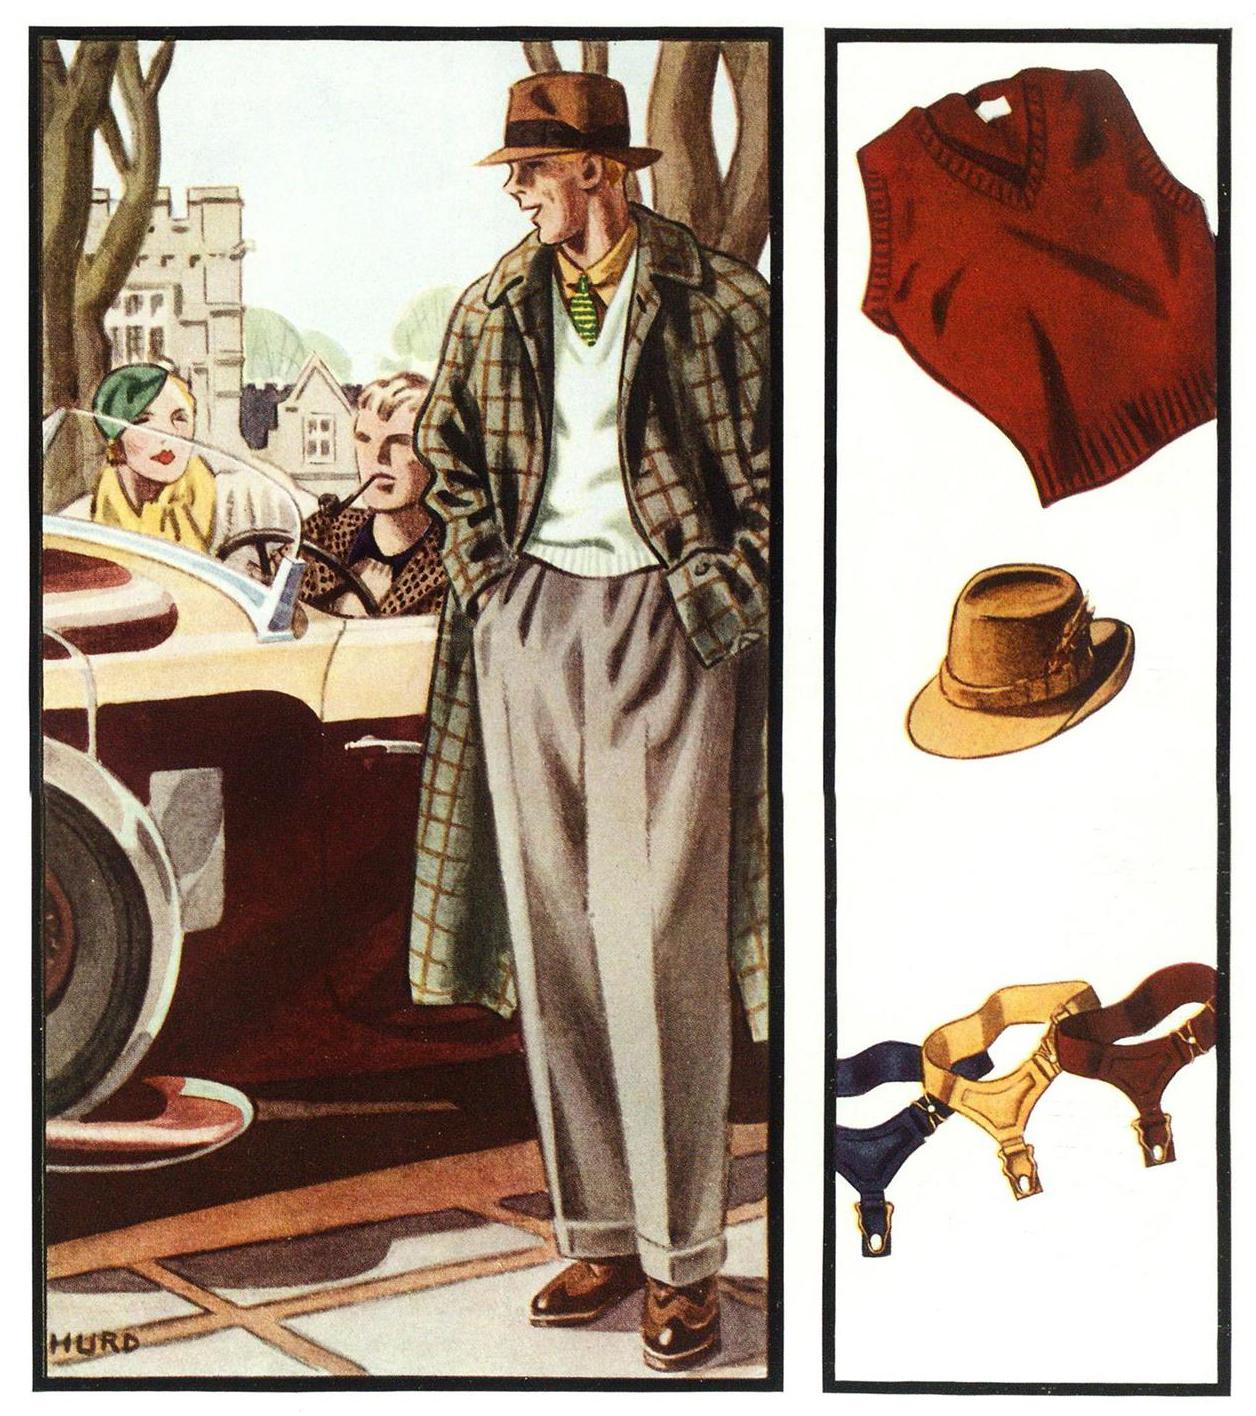 "Esquire, 1 марта 1934 года. Иллюстрация к статье о моде выпускников колледжей ""What? Garters On A Page Of College Fashions? Yes, Sir"""